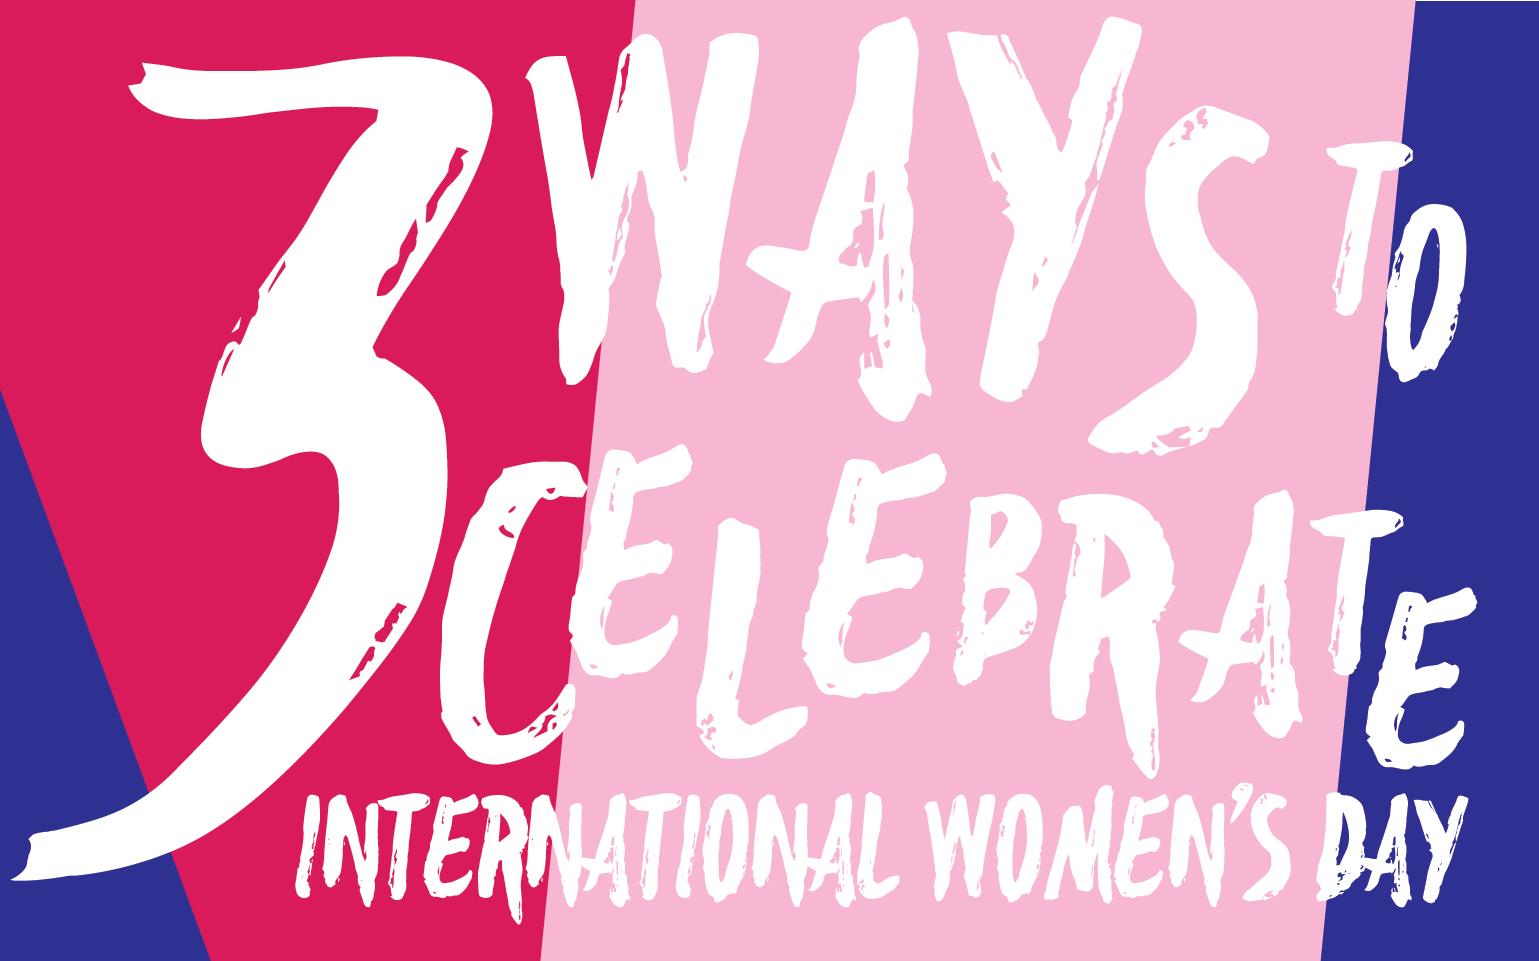 Three ways to celebrate international women's day